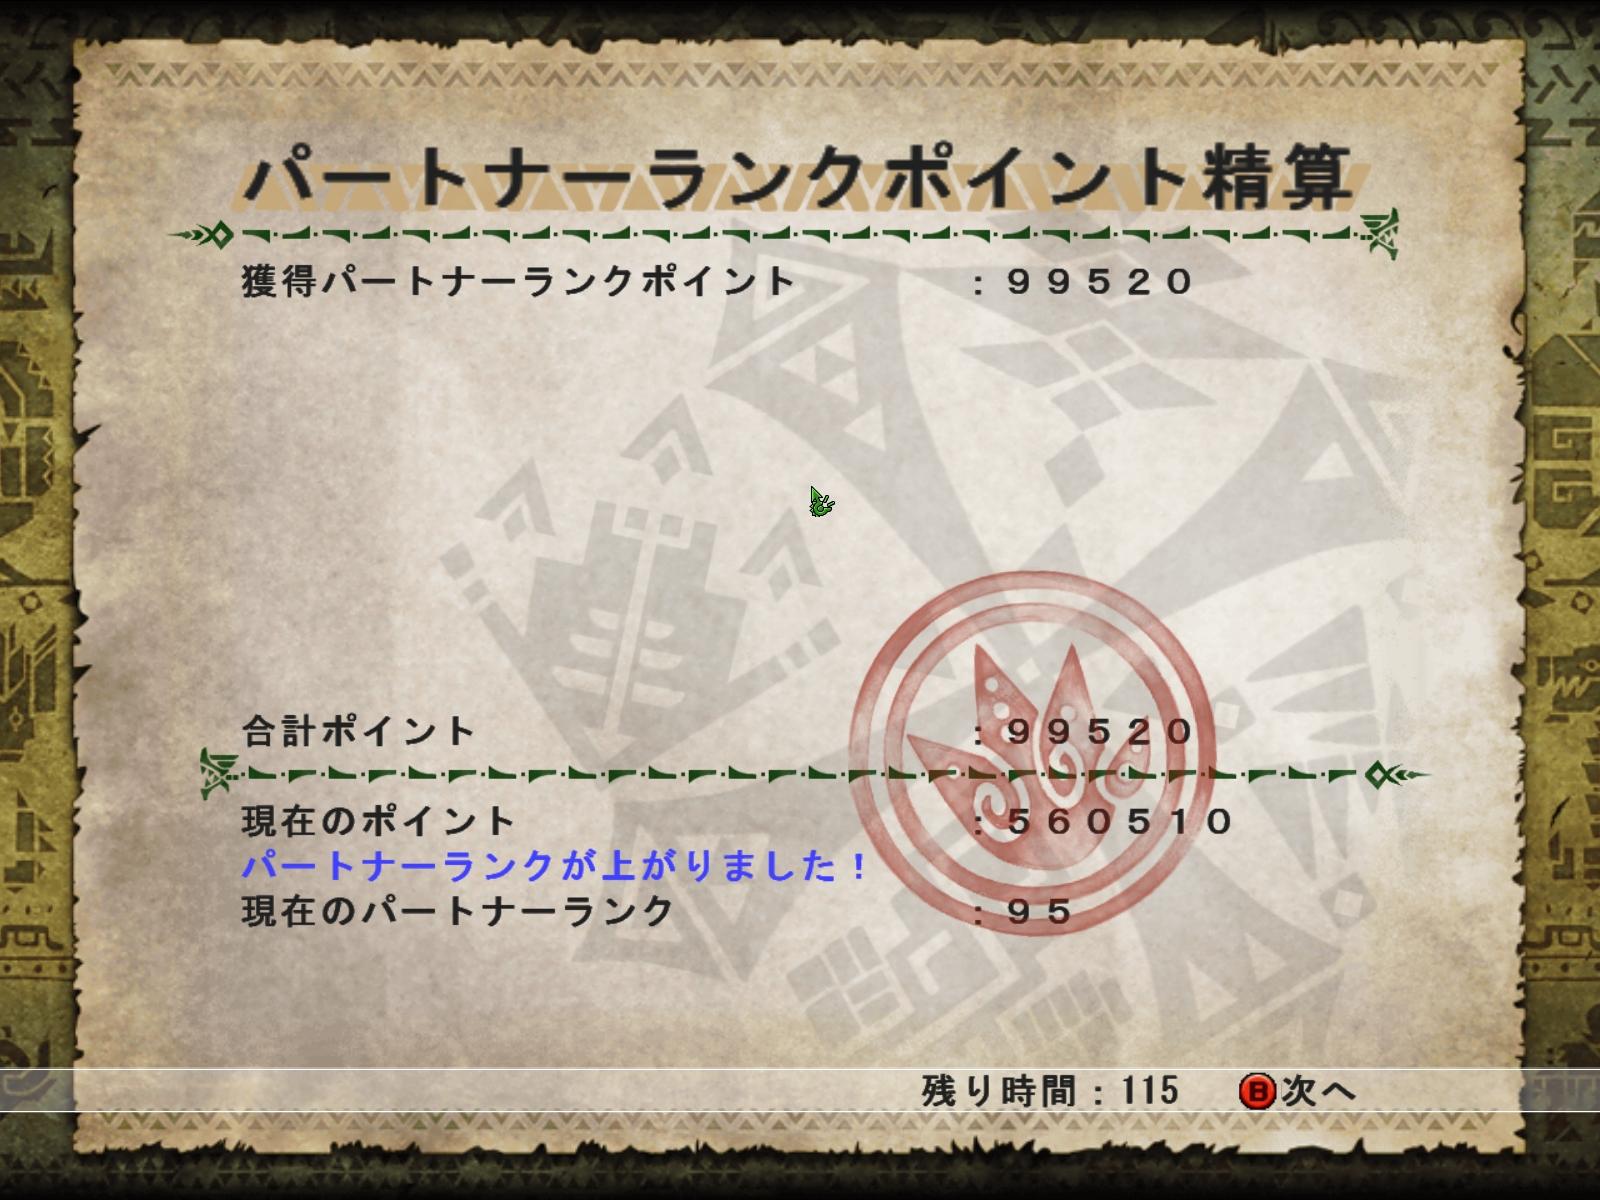 mhf_20131221_131809_960.jpg